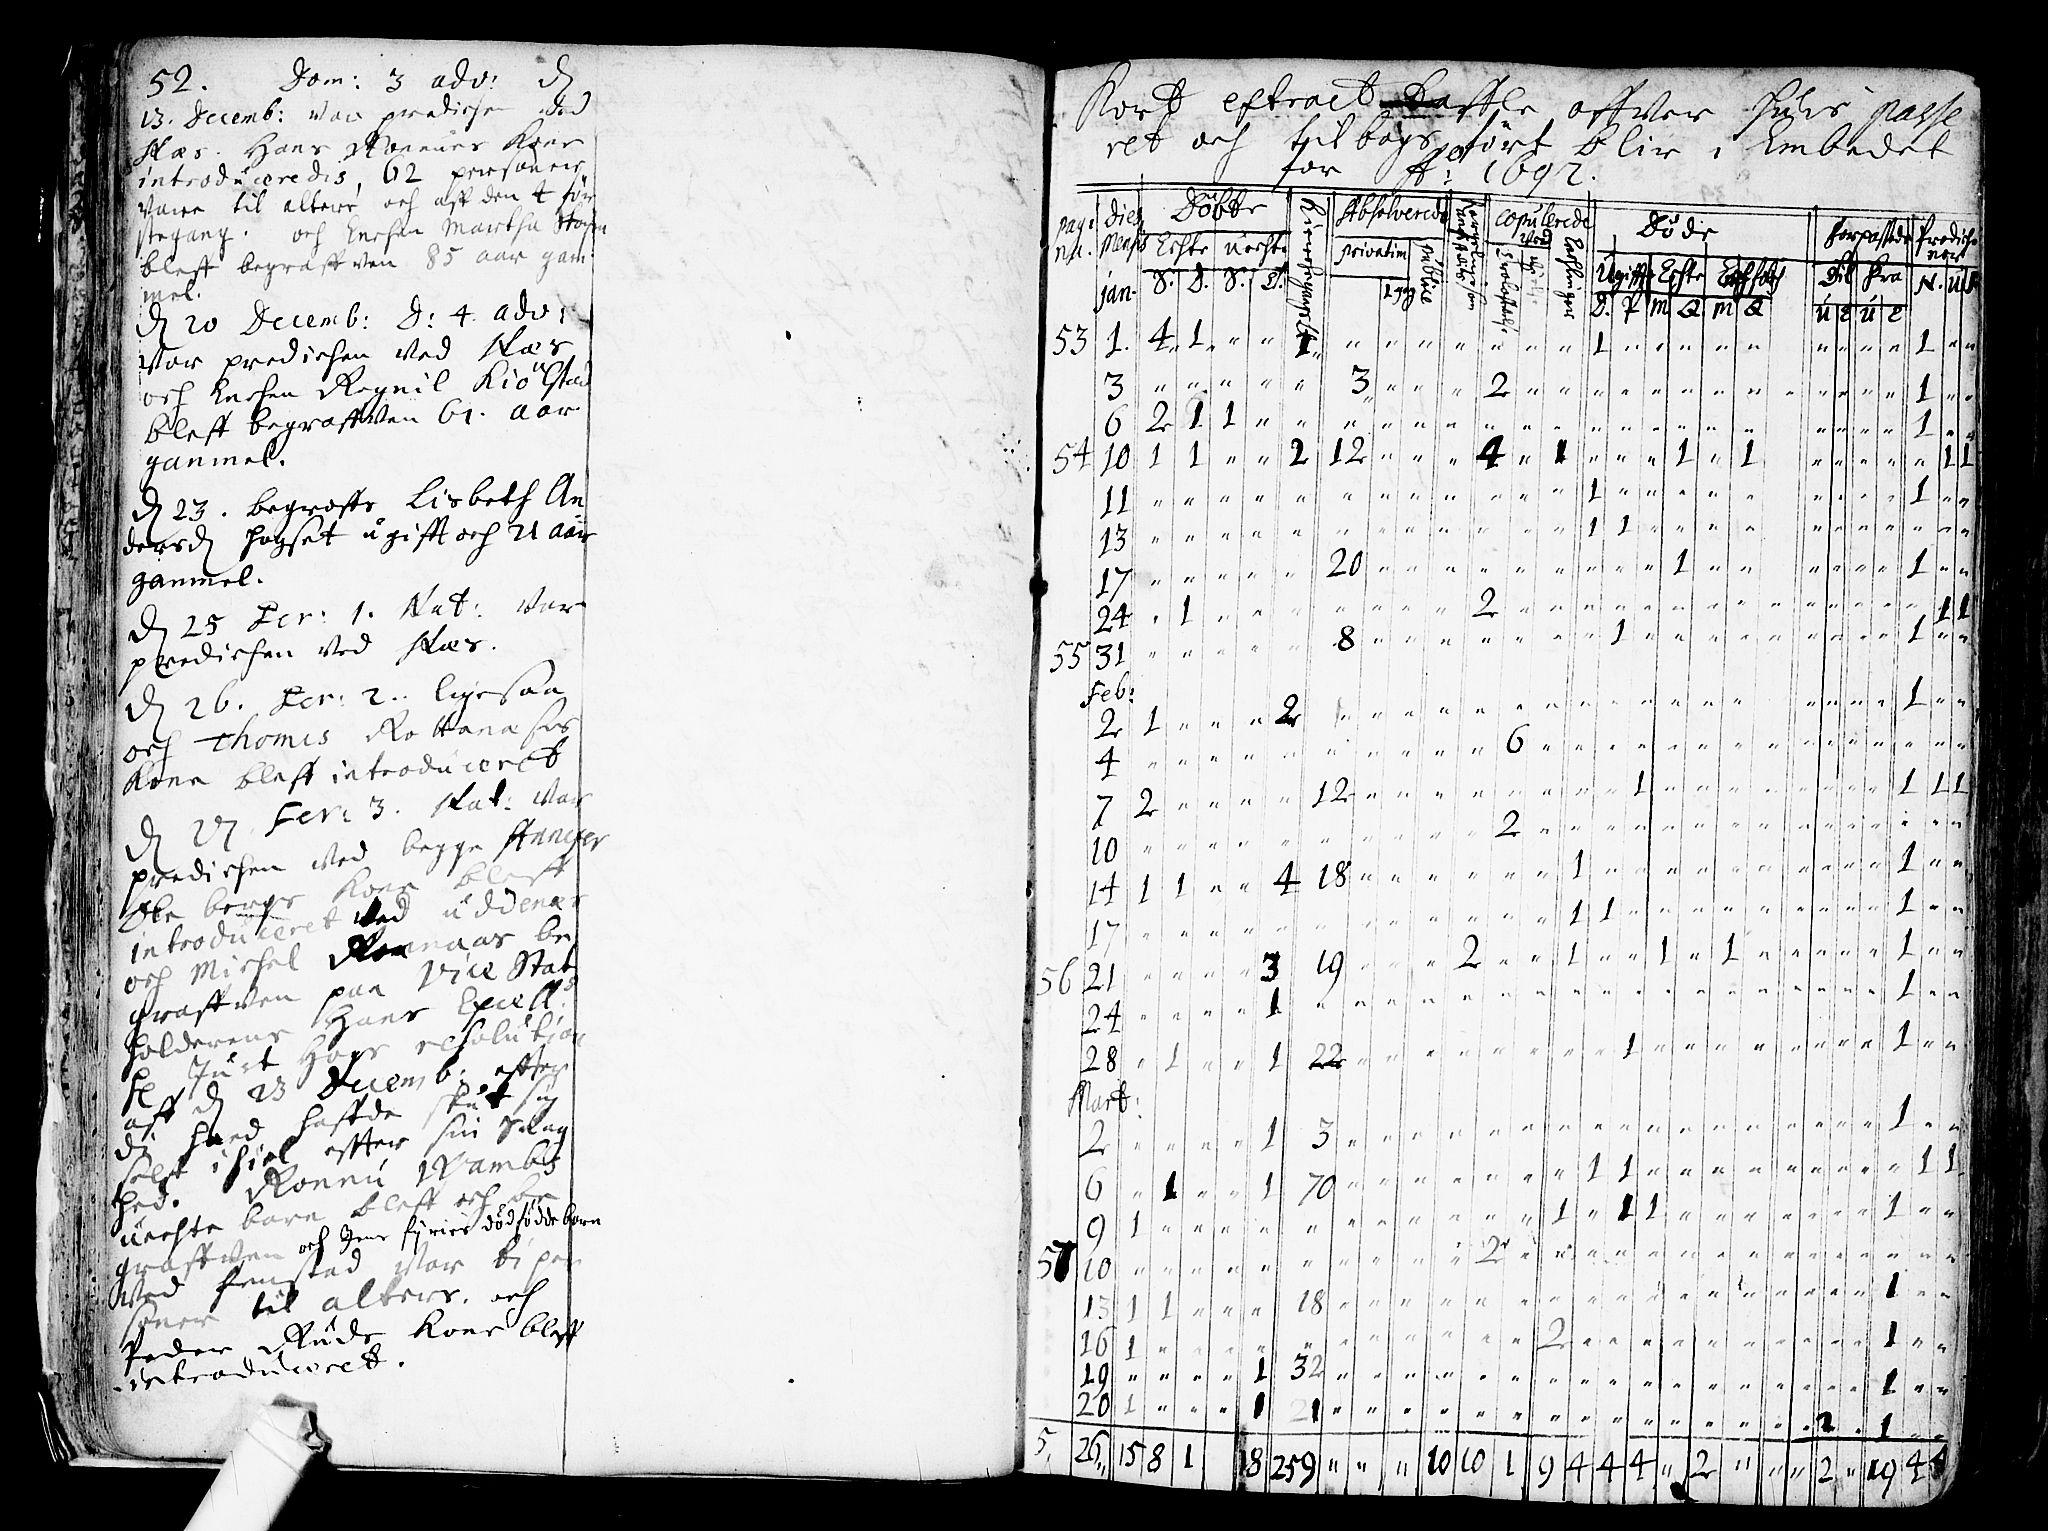 SAO, Nes prestekontor Kirkebøker, F/Fa/L0001: Parish register (official) no. I 1, 1689-1716, p. 52a-52b